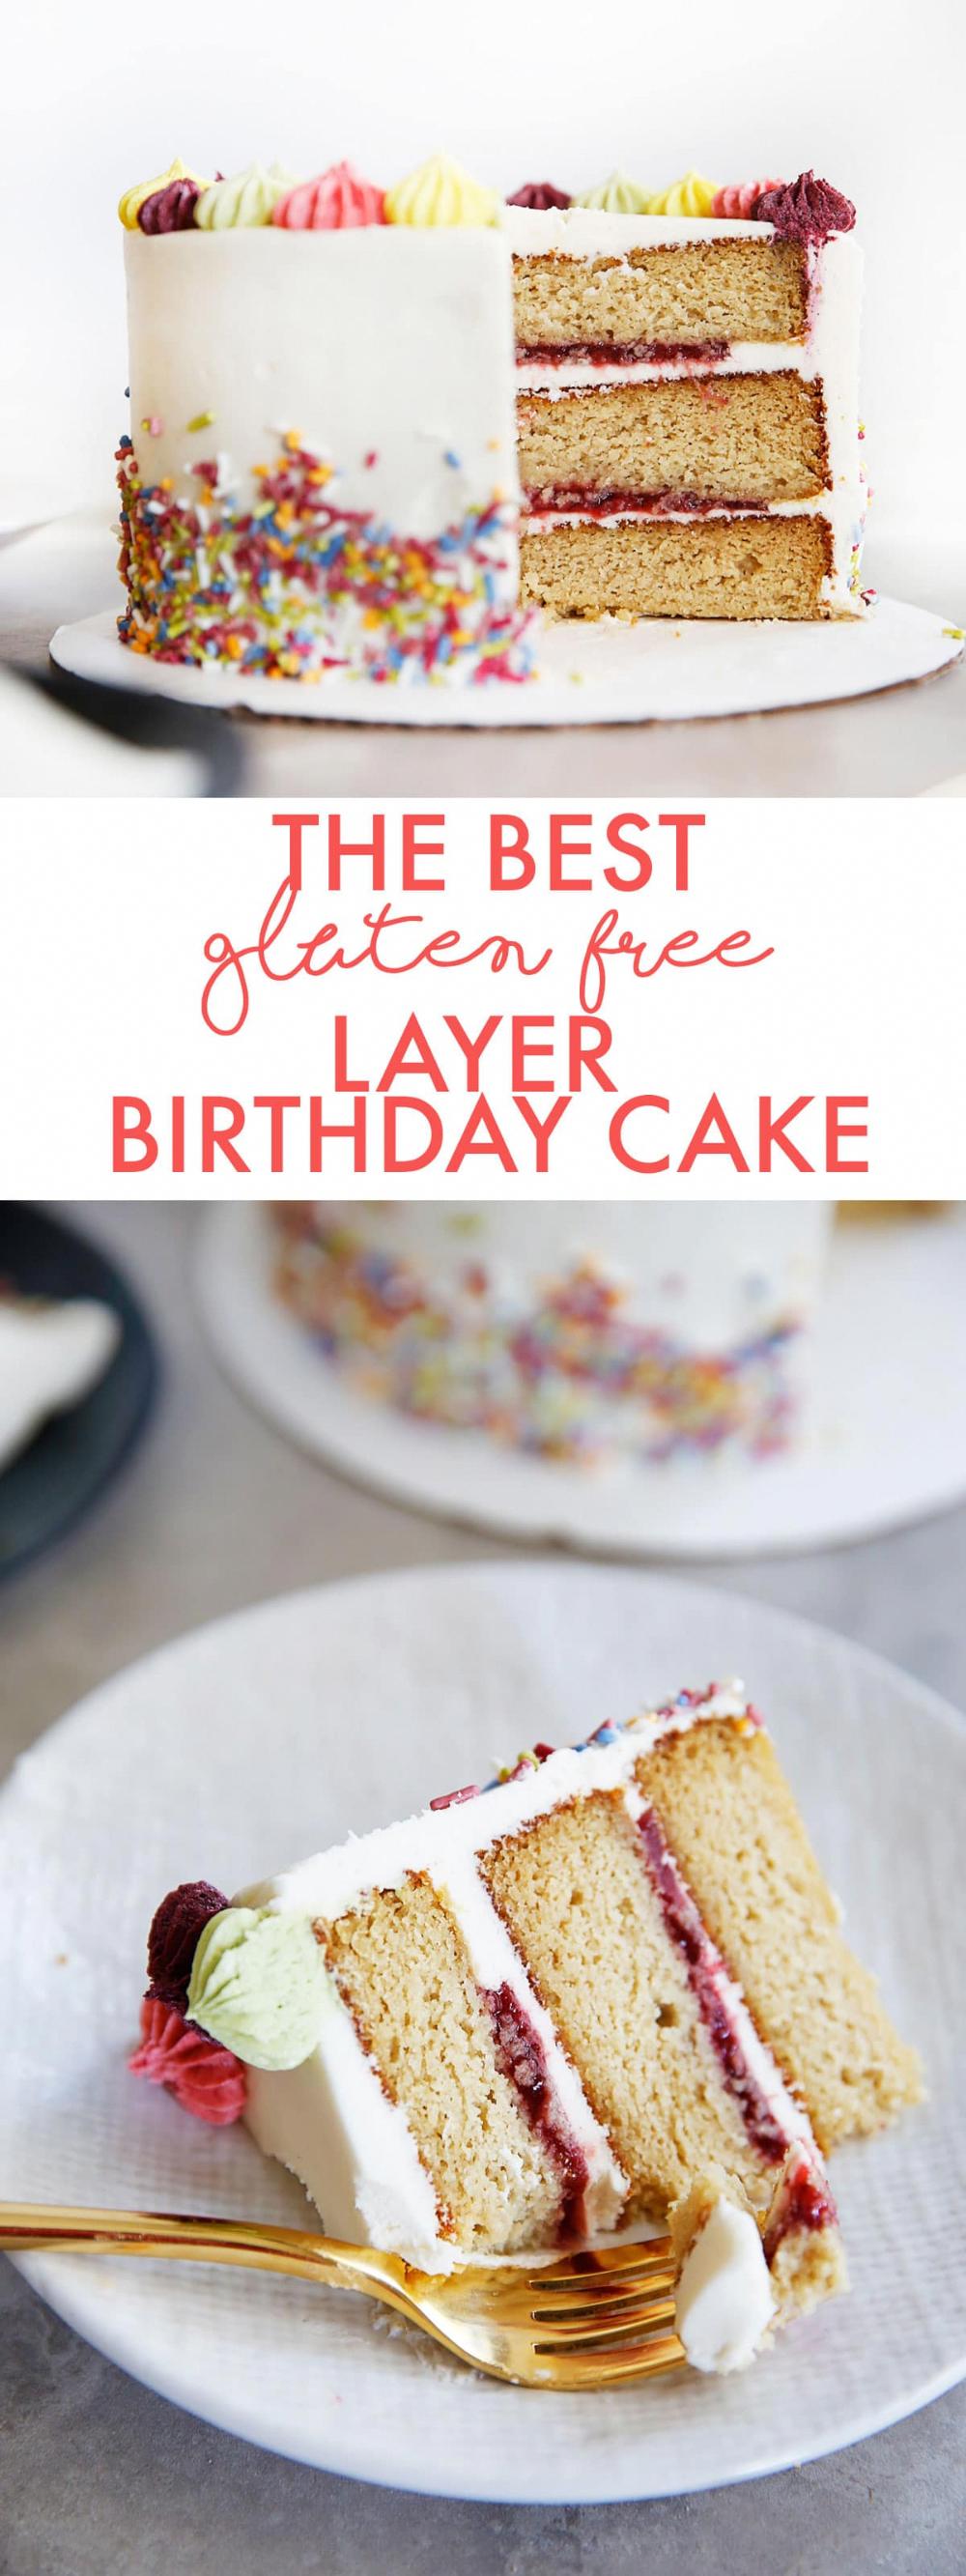 The BEST GlutenFree Layer Birthday Cake Lexi's Clean